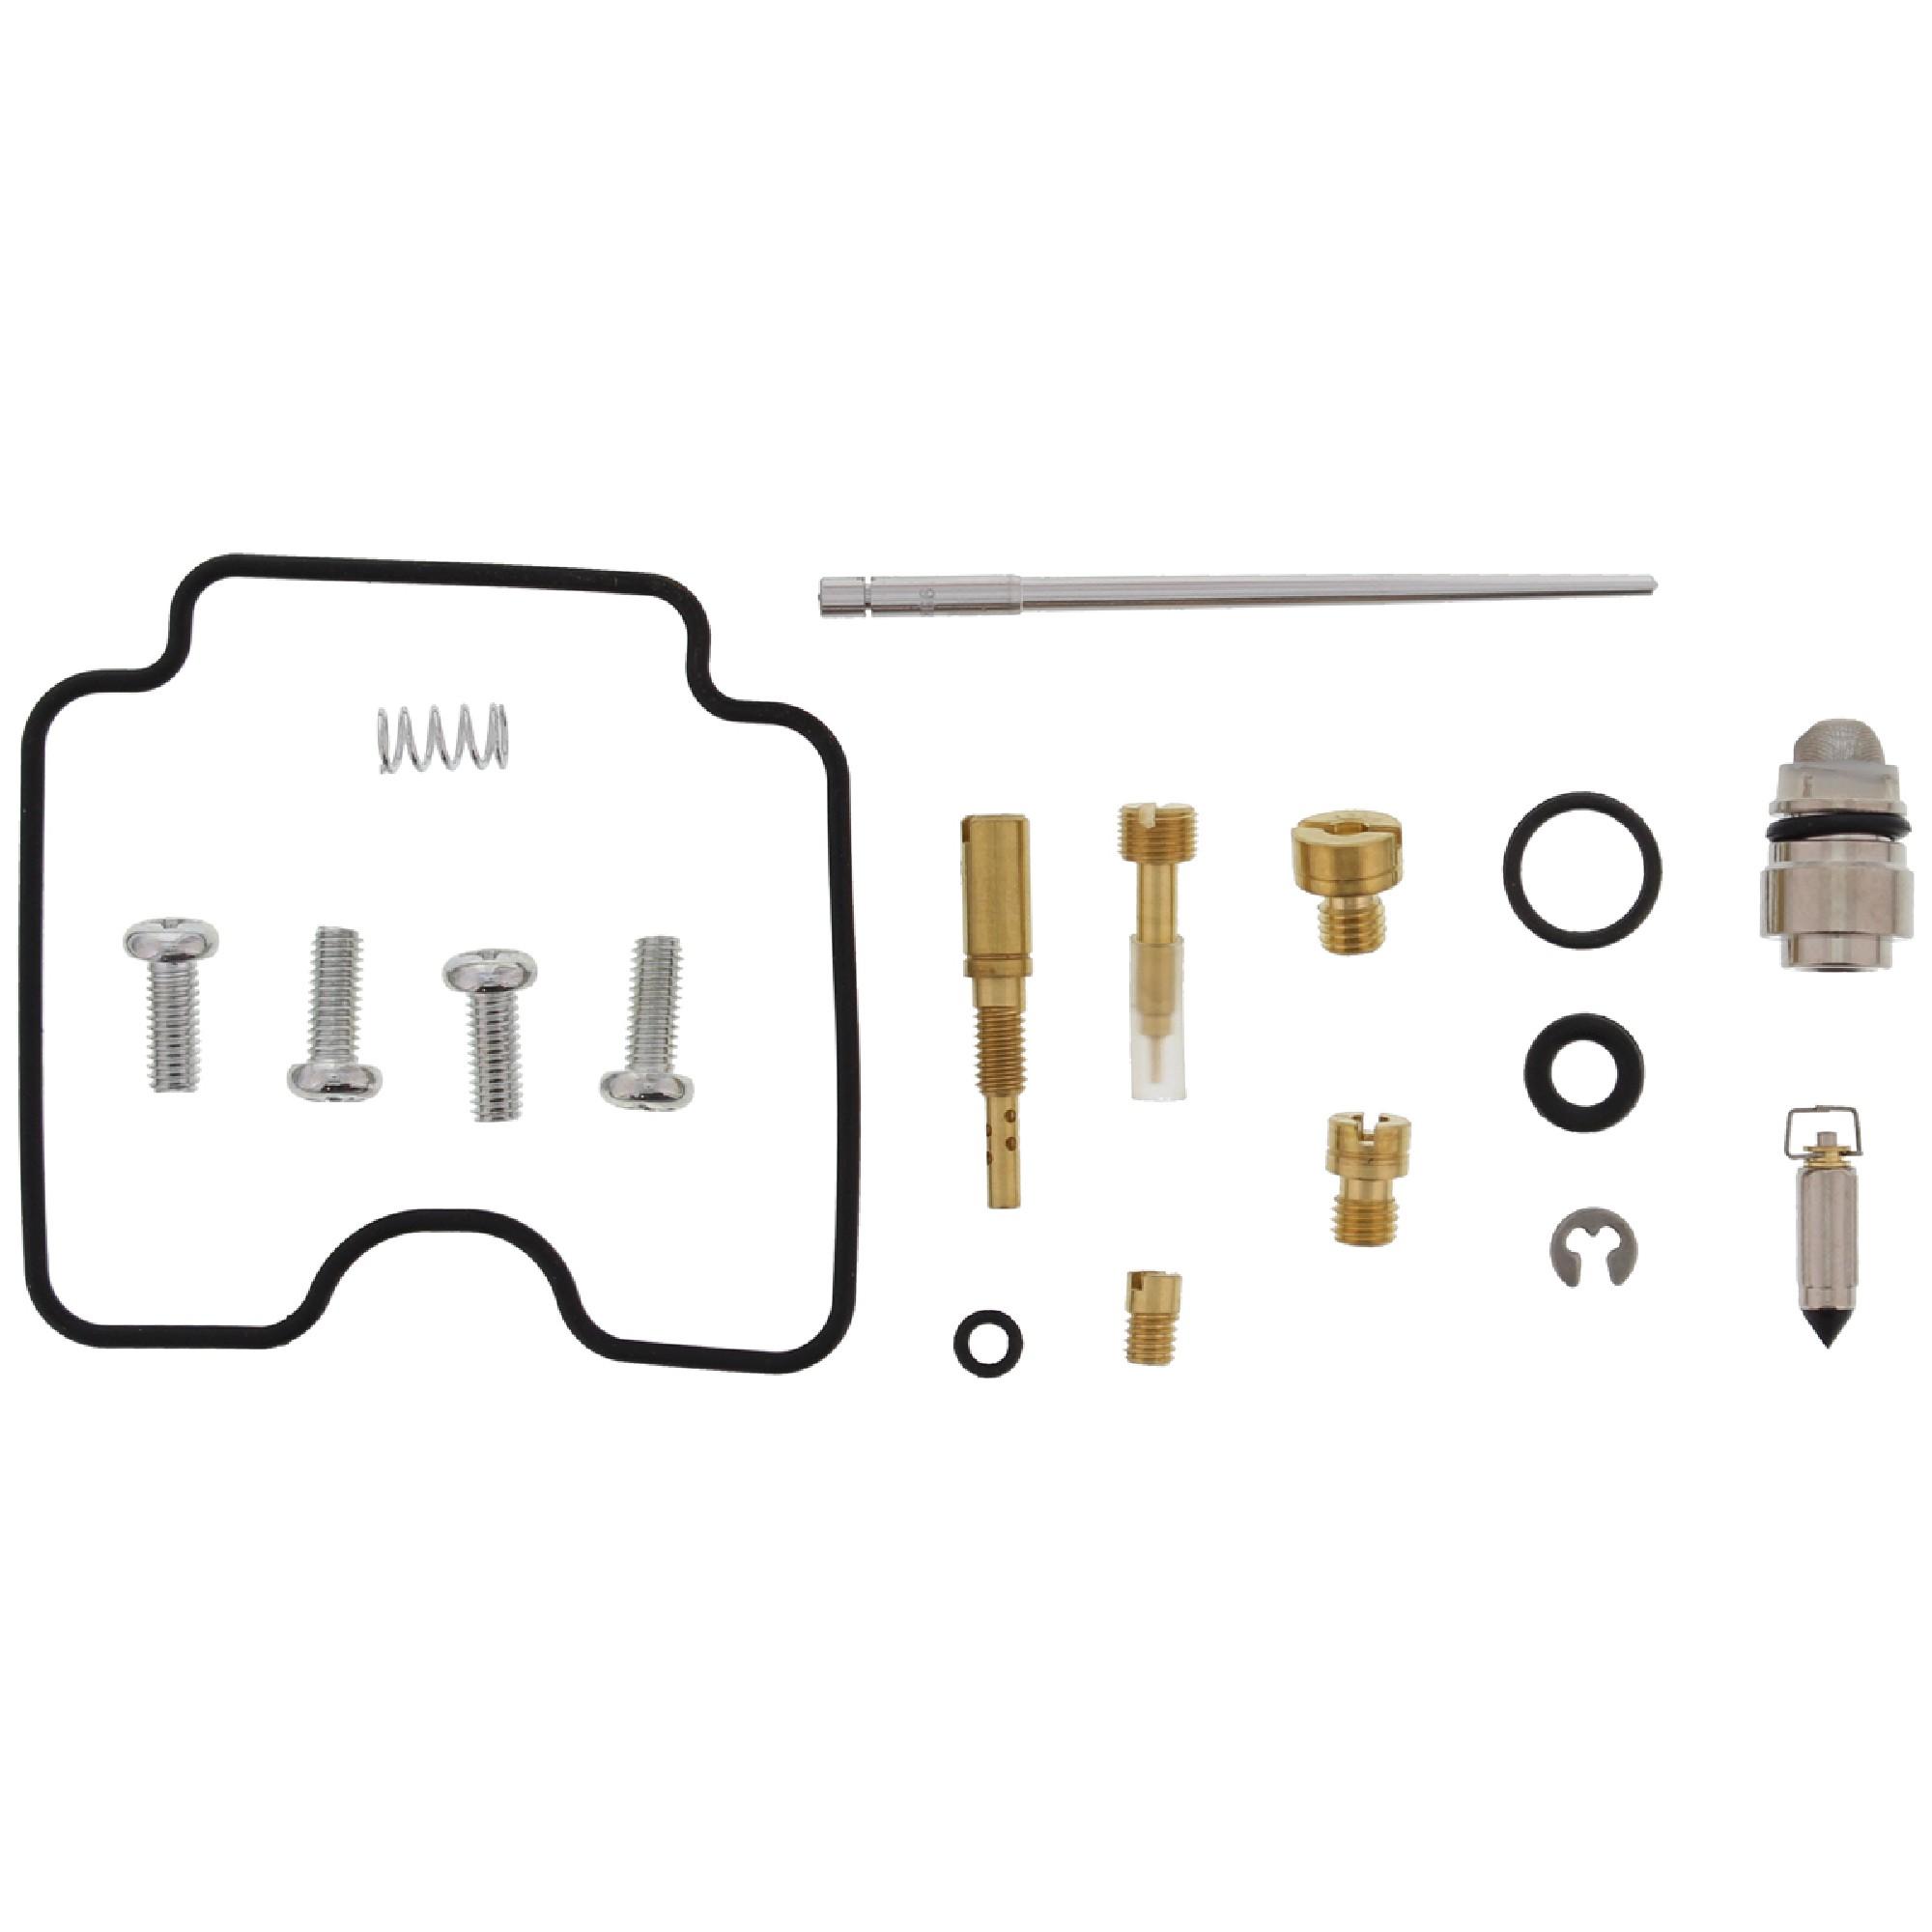 New All Balls Carburetor Rebuild Kit 26-1259 For Yamaha